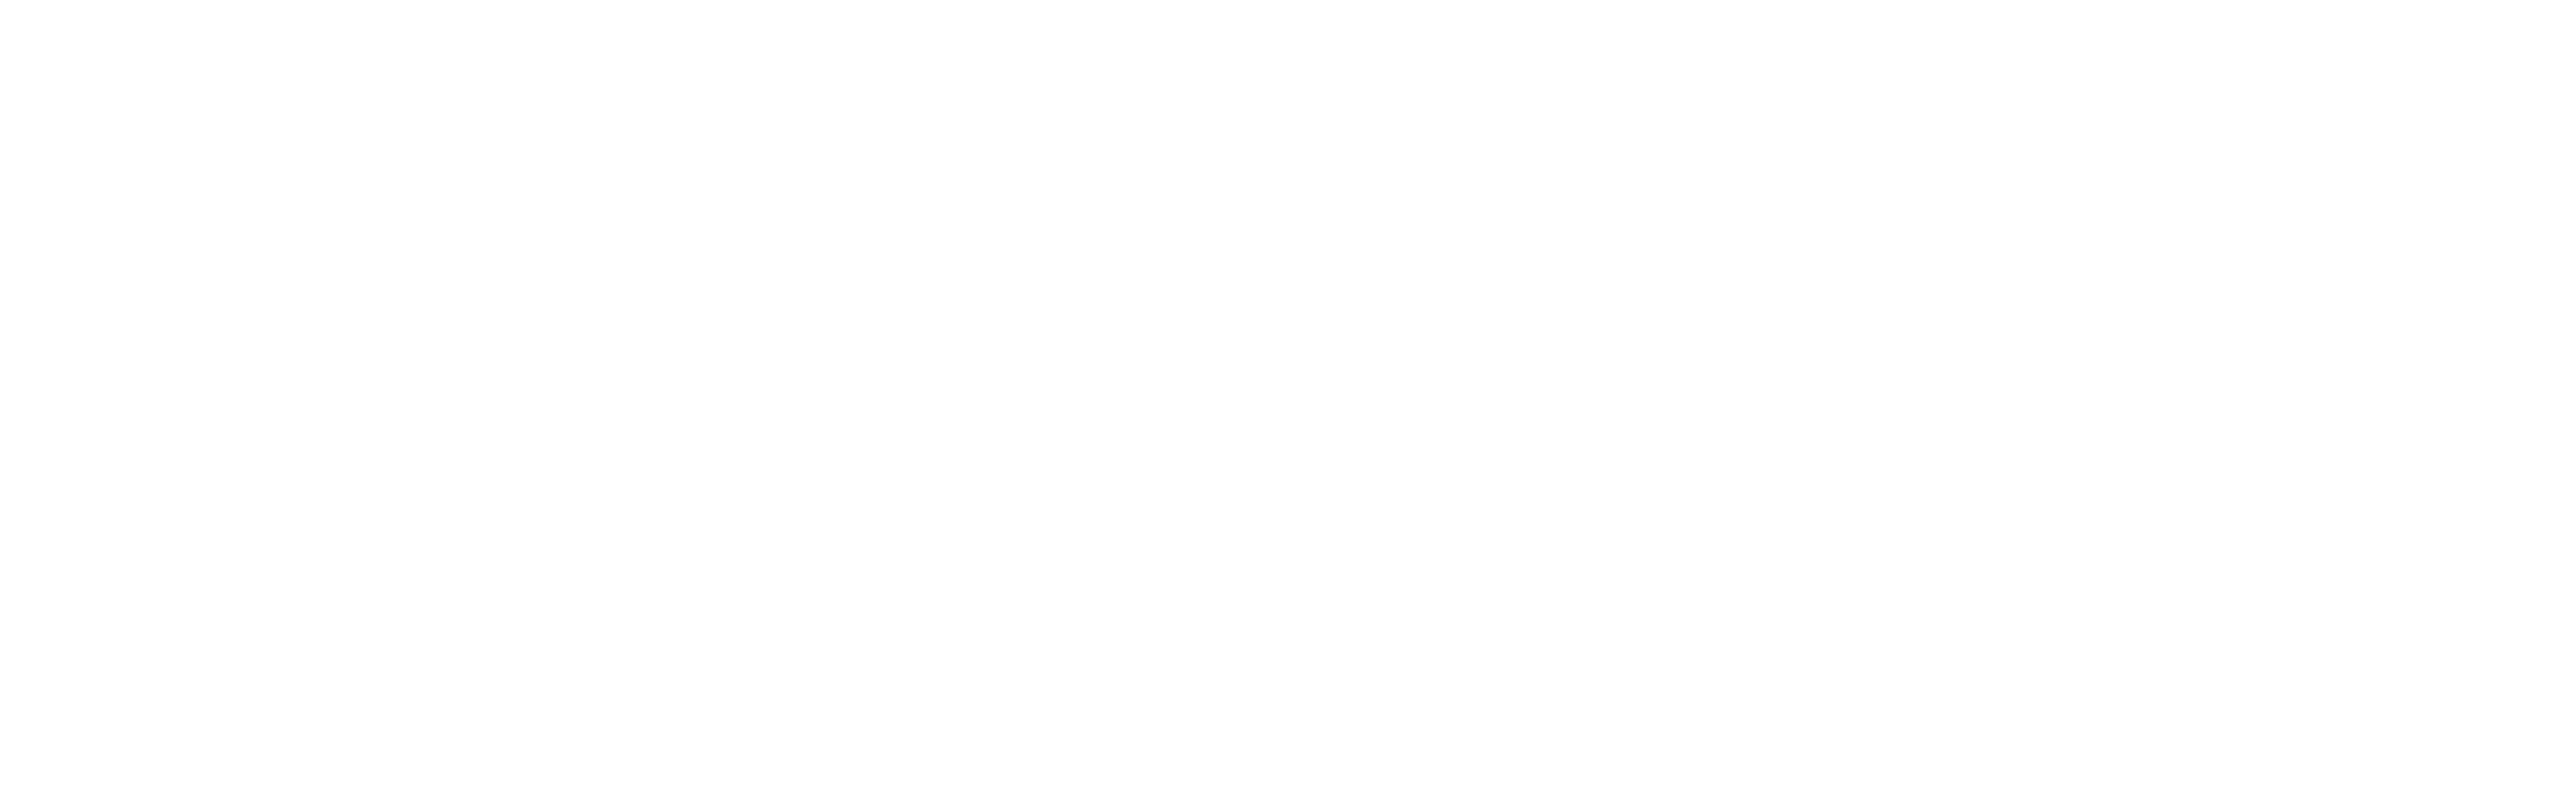 Josée Cristiano - Graphiste multimédia & Photographe